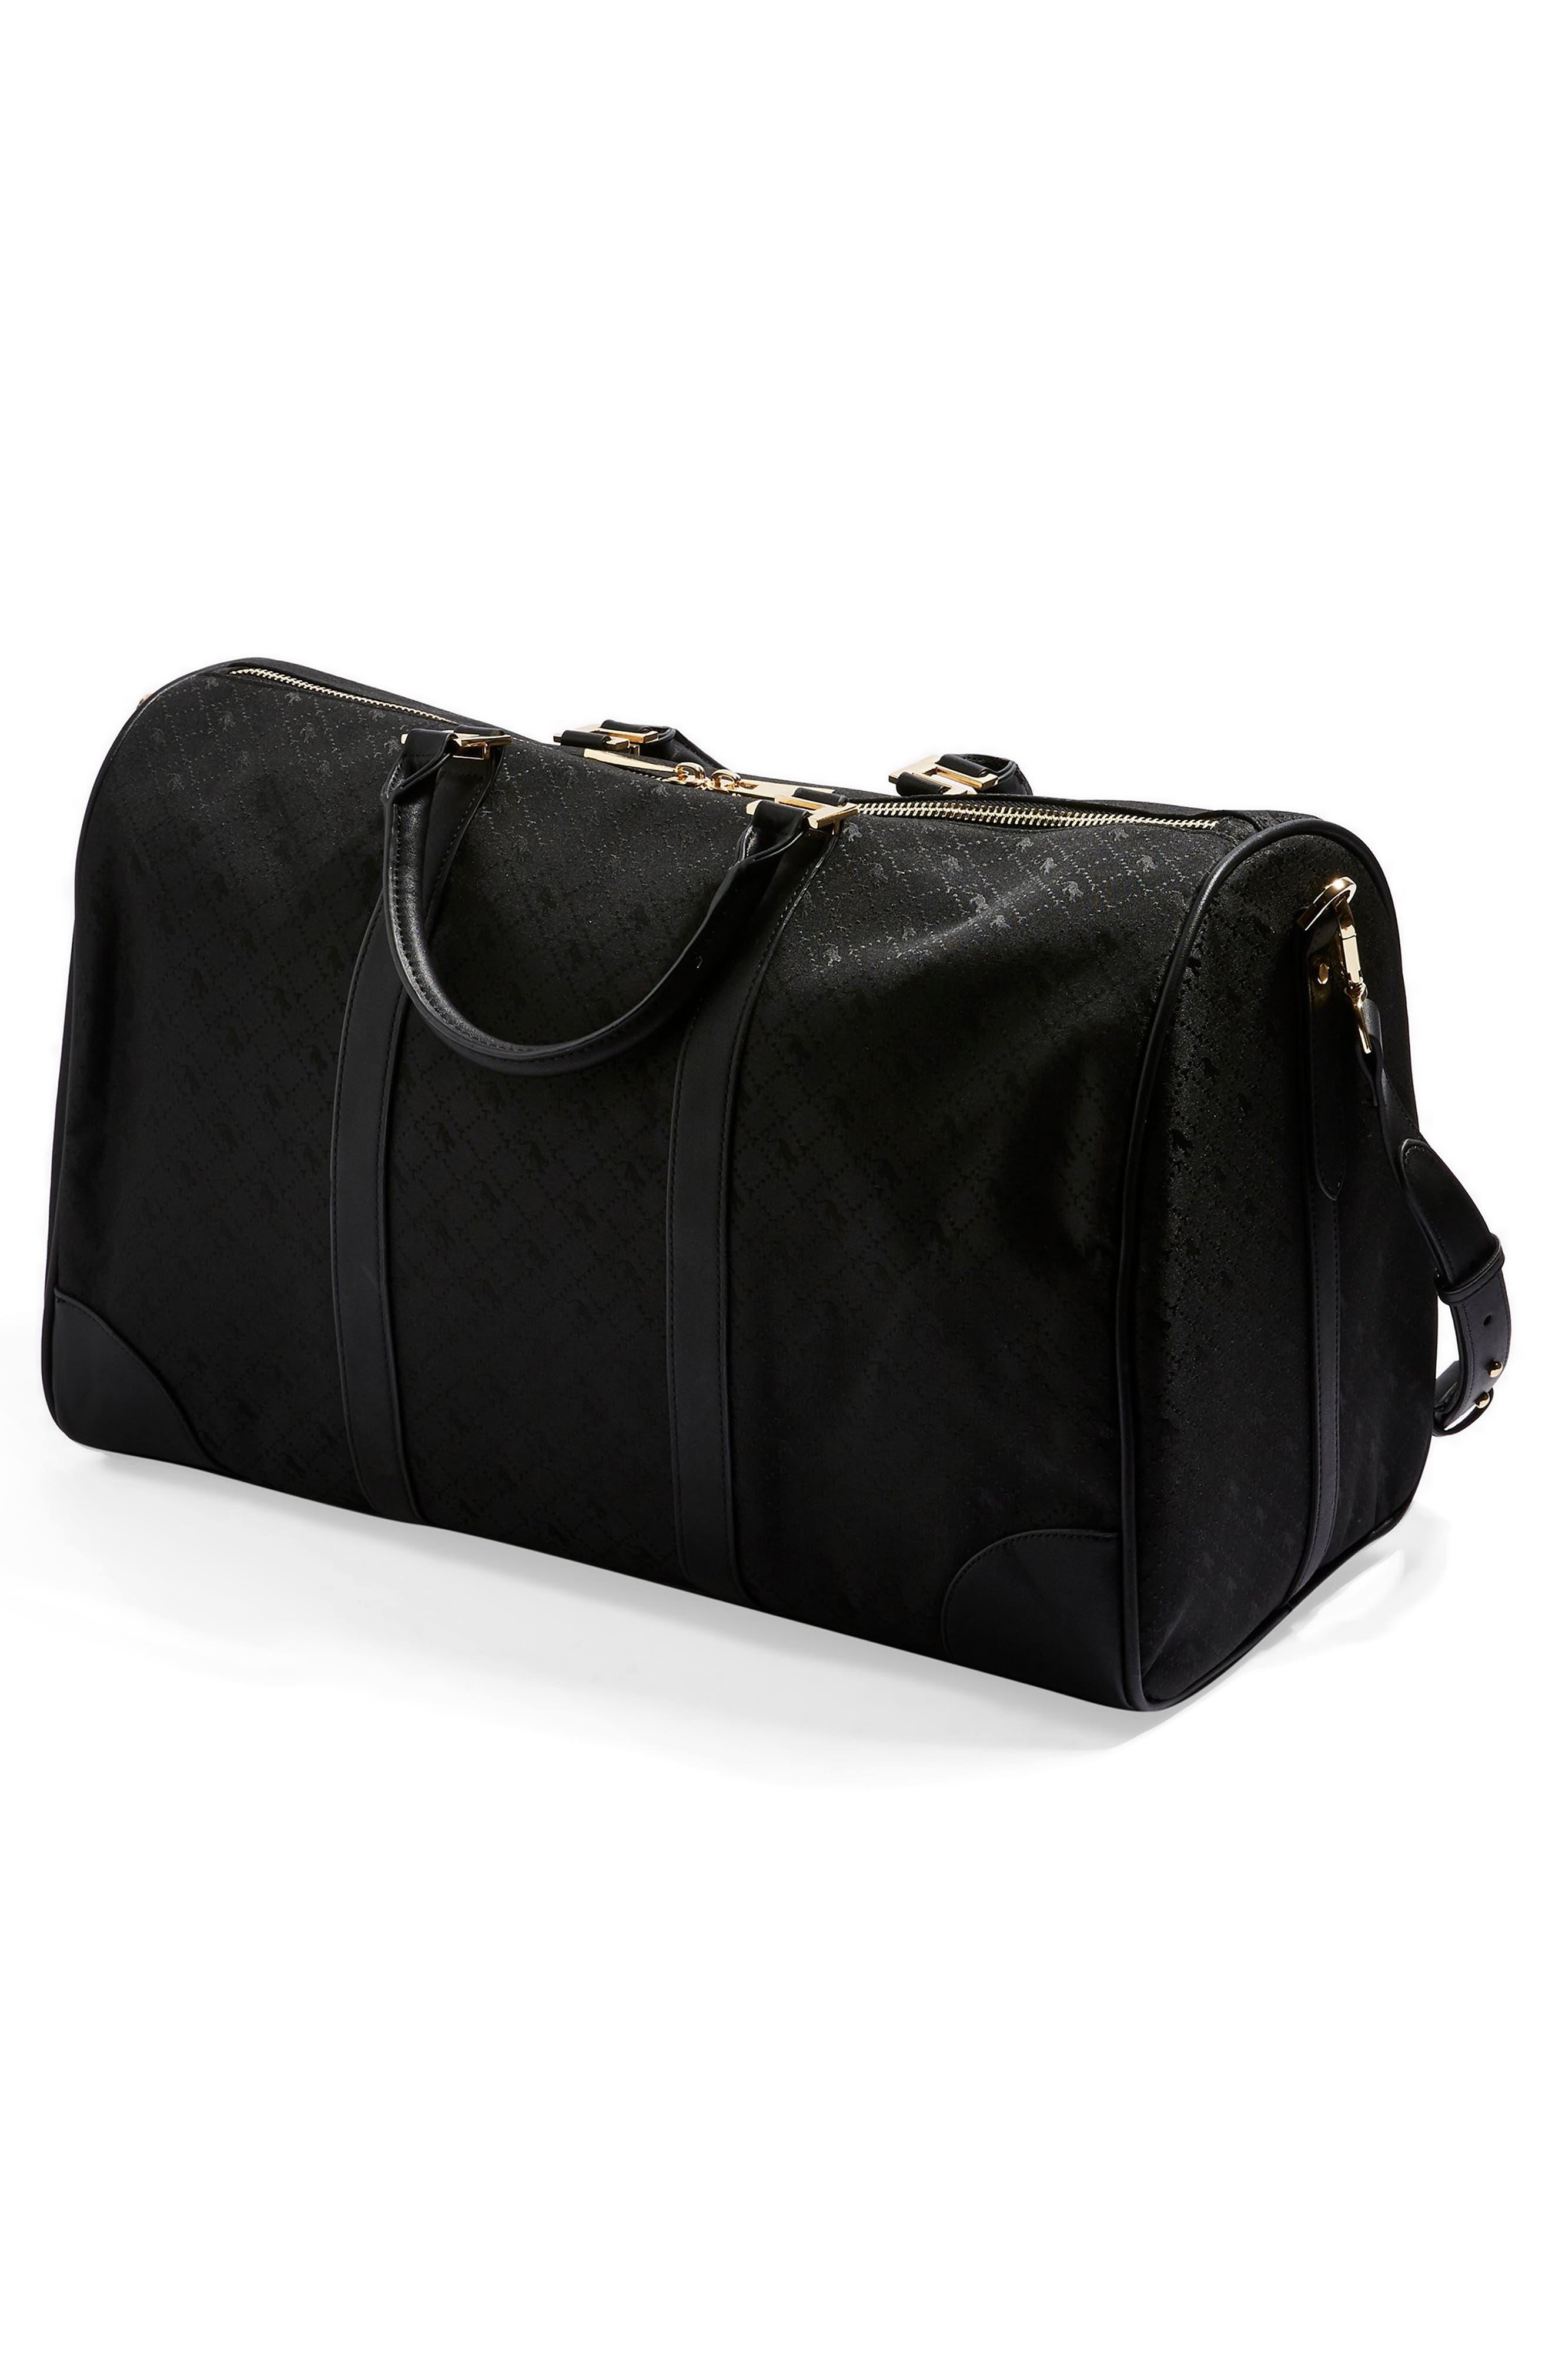 TOPSHOP,                             Large Madrid Duffel Bag,                             Alternate thumbnail 4, color,                             BLACK